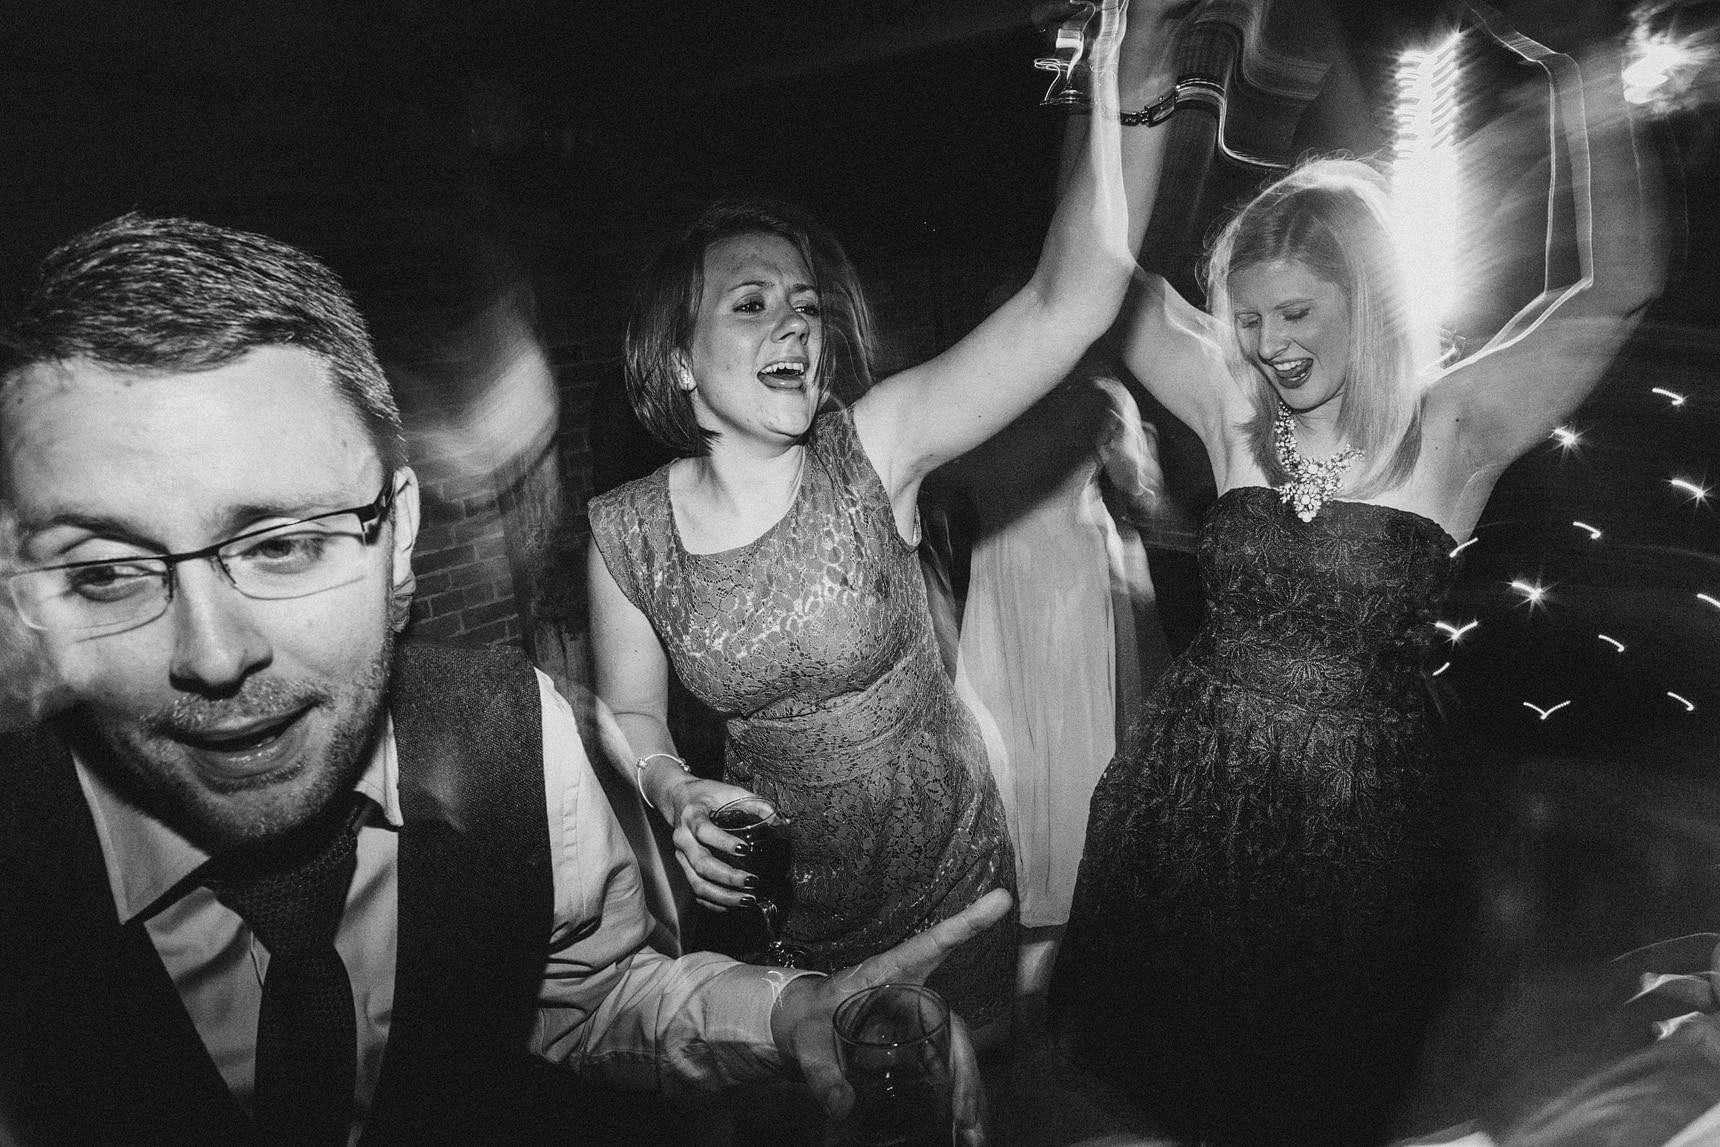 danceing wedding photo